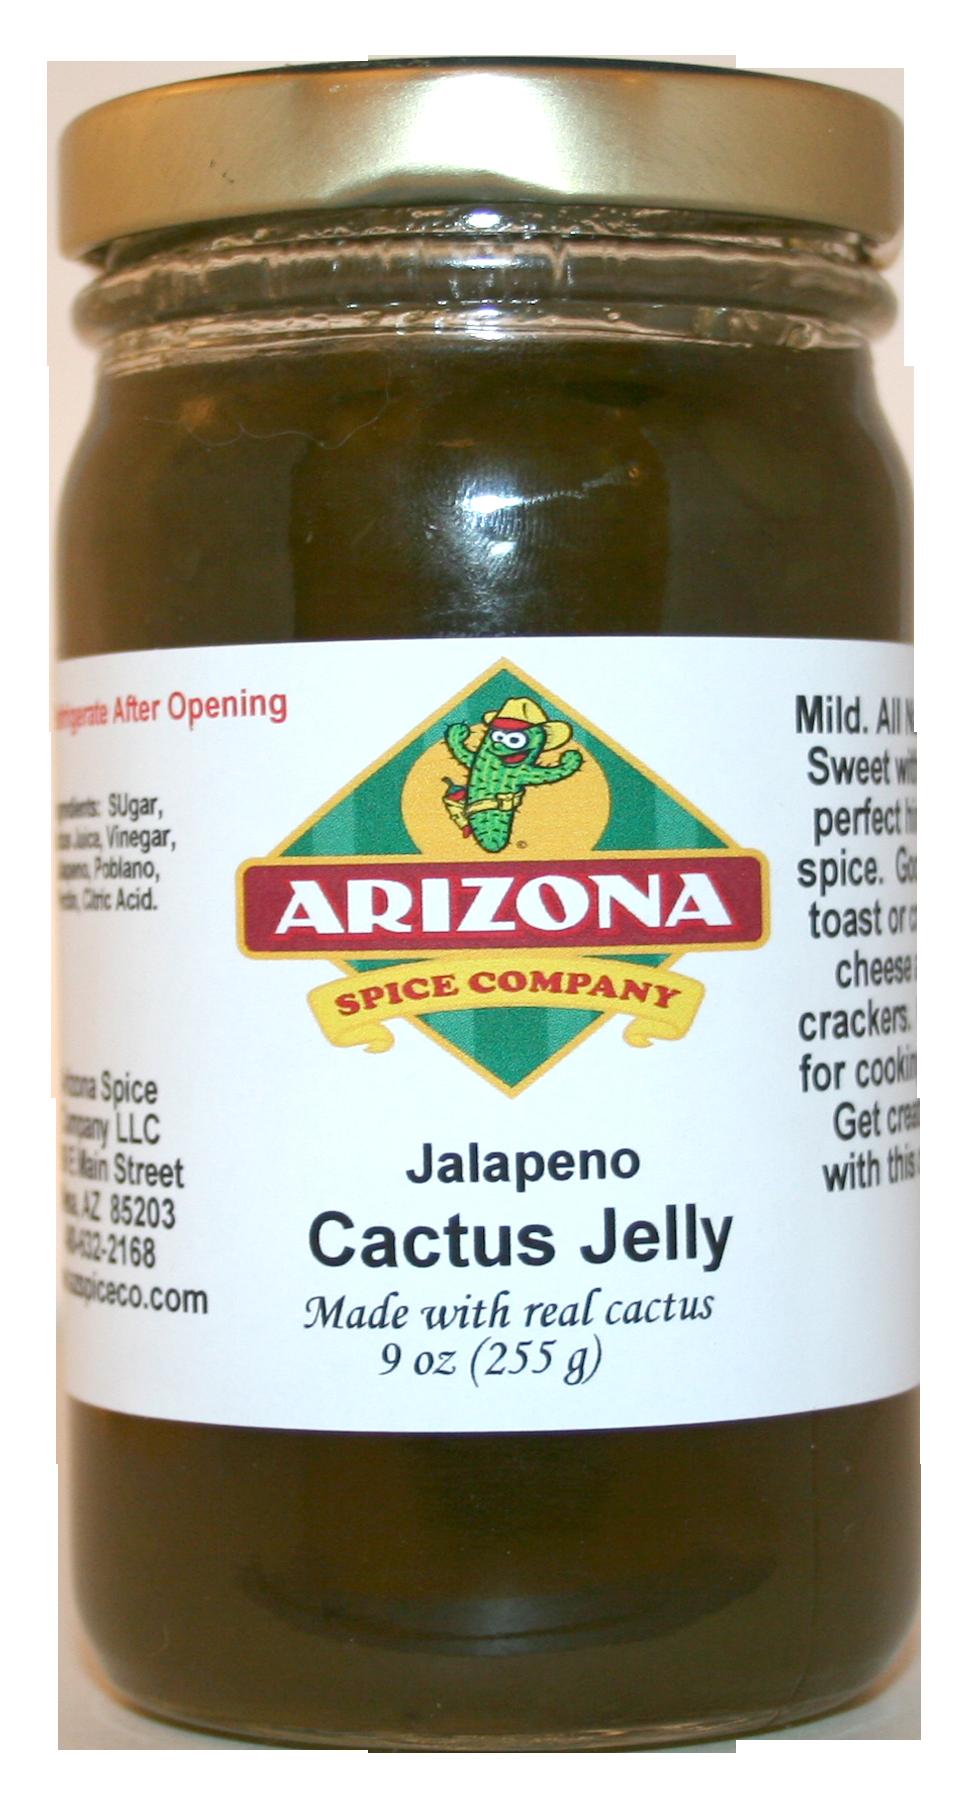 Arizona Salsa and Spice Co image 28